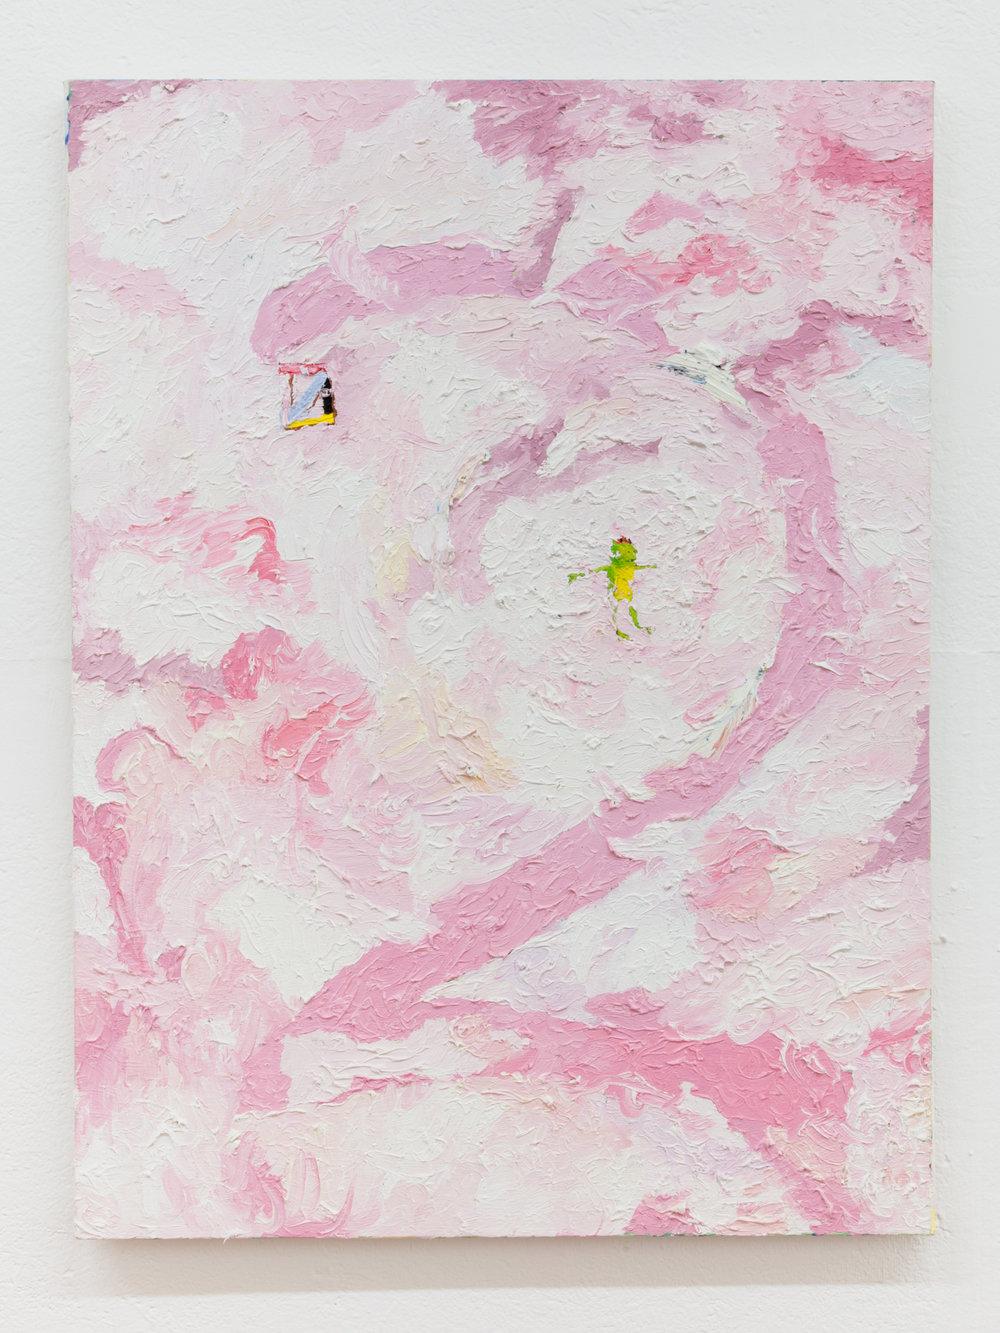 Jesse Sullivan,  2 , 2018, Oil on Canvas, 40 x 30 inches